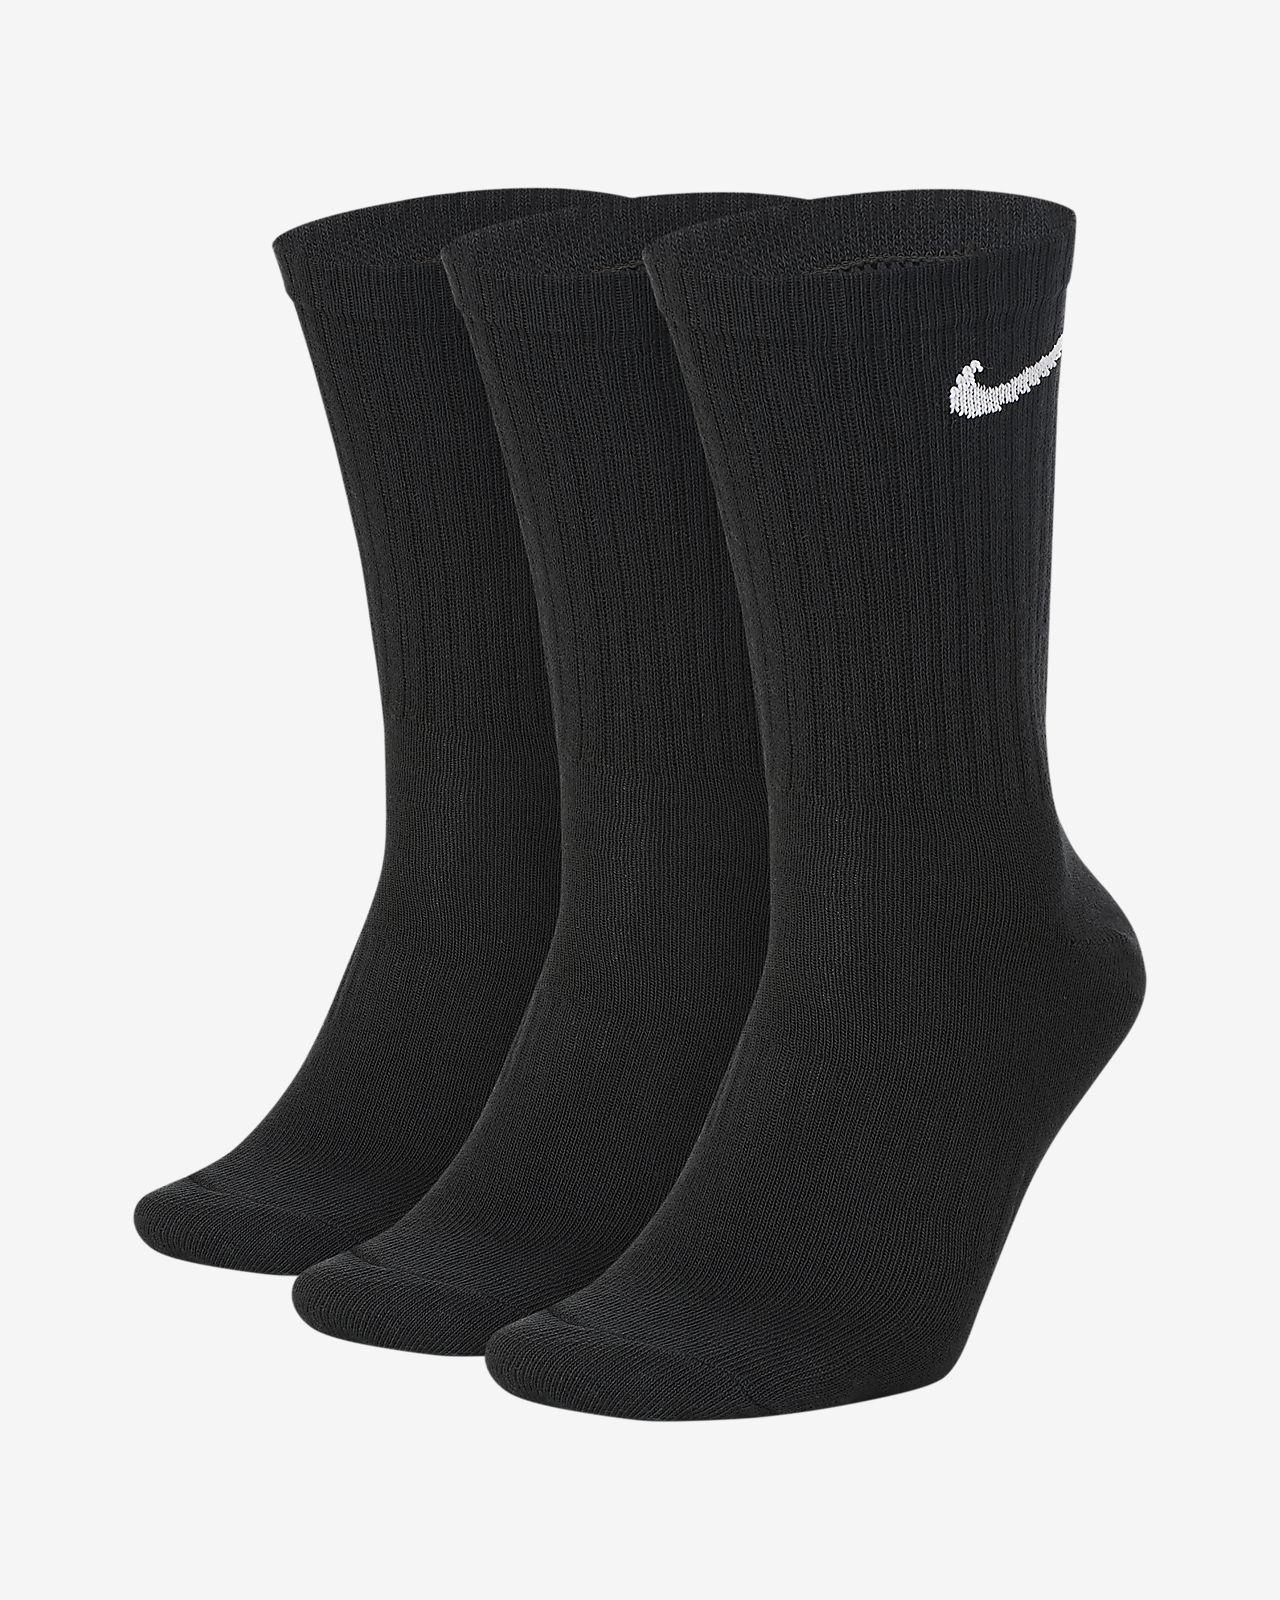 Nike Socks Youth High Crew 2 pair SB Skate Everyday Athletic Sports Boys Girls